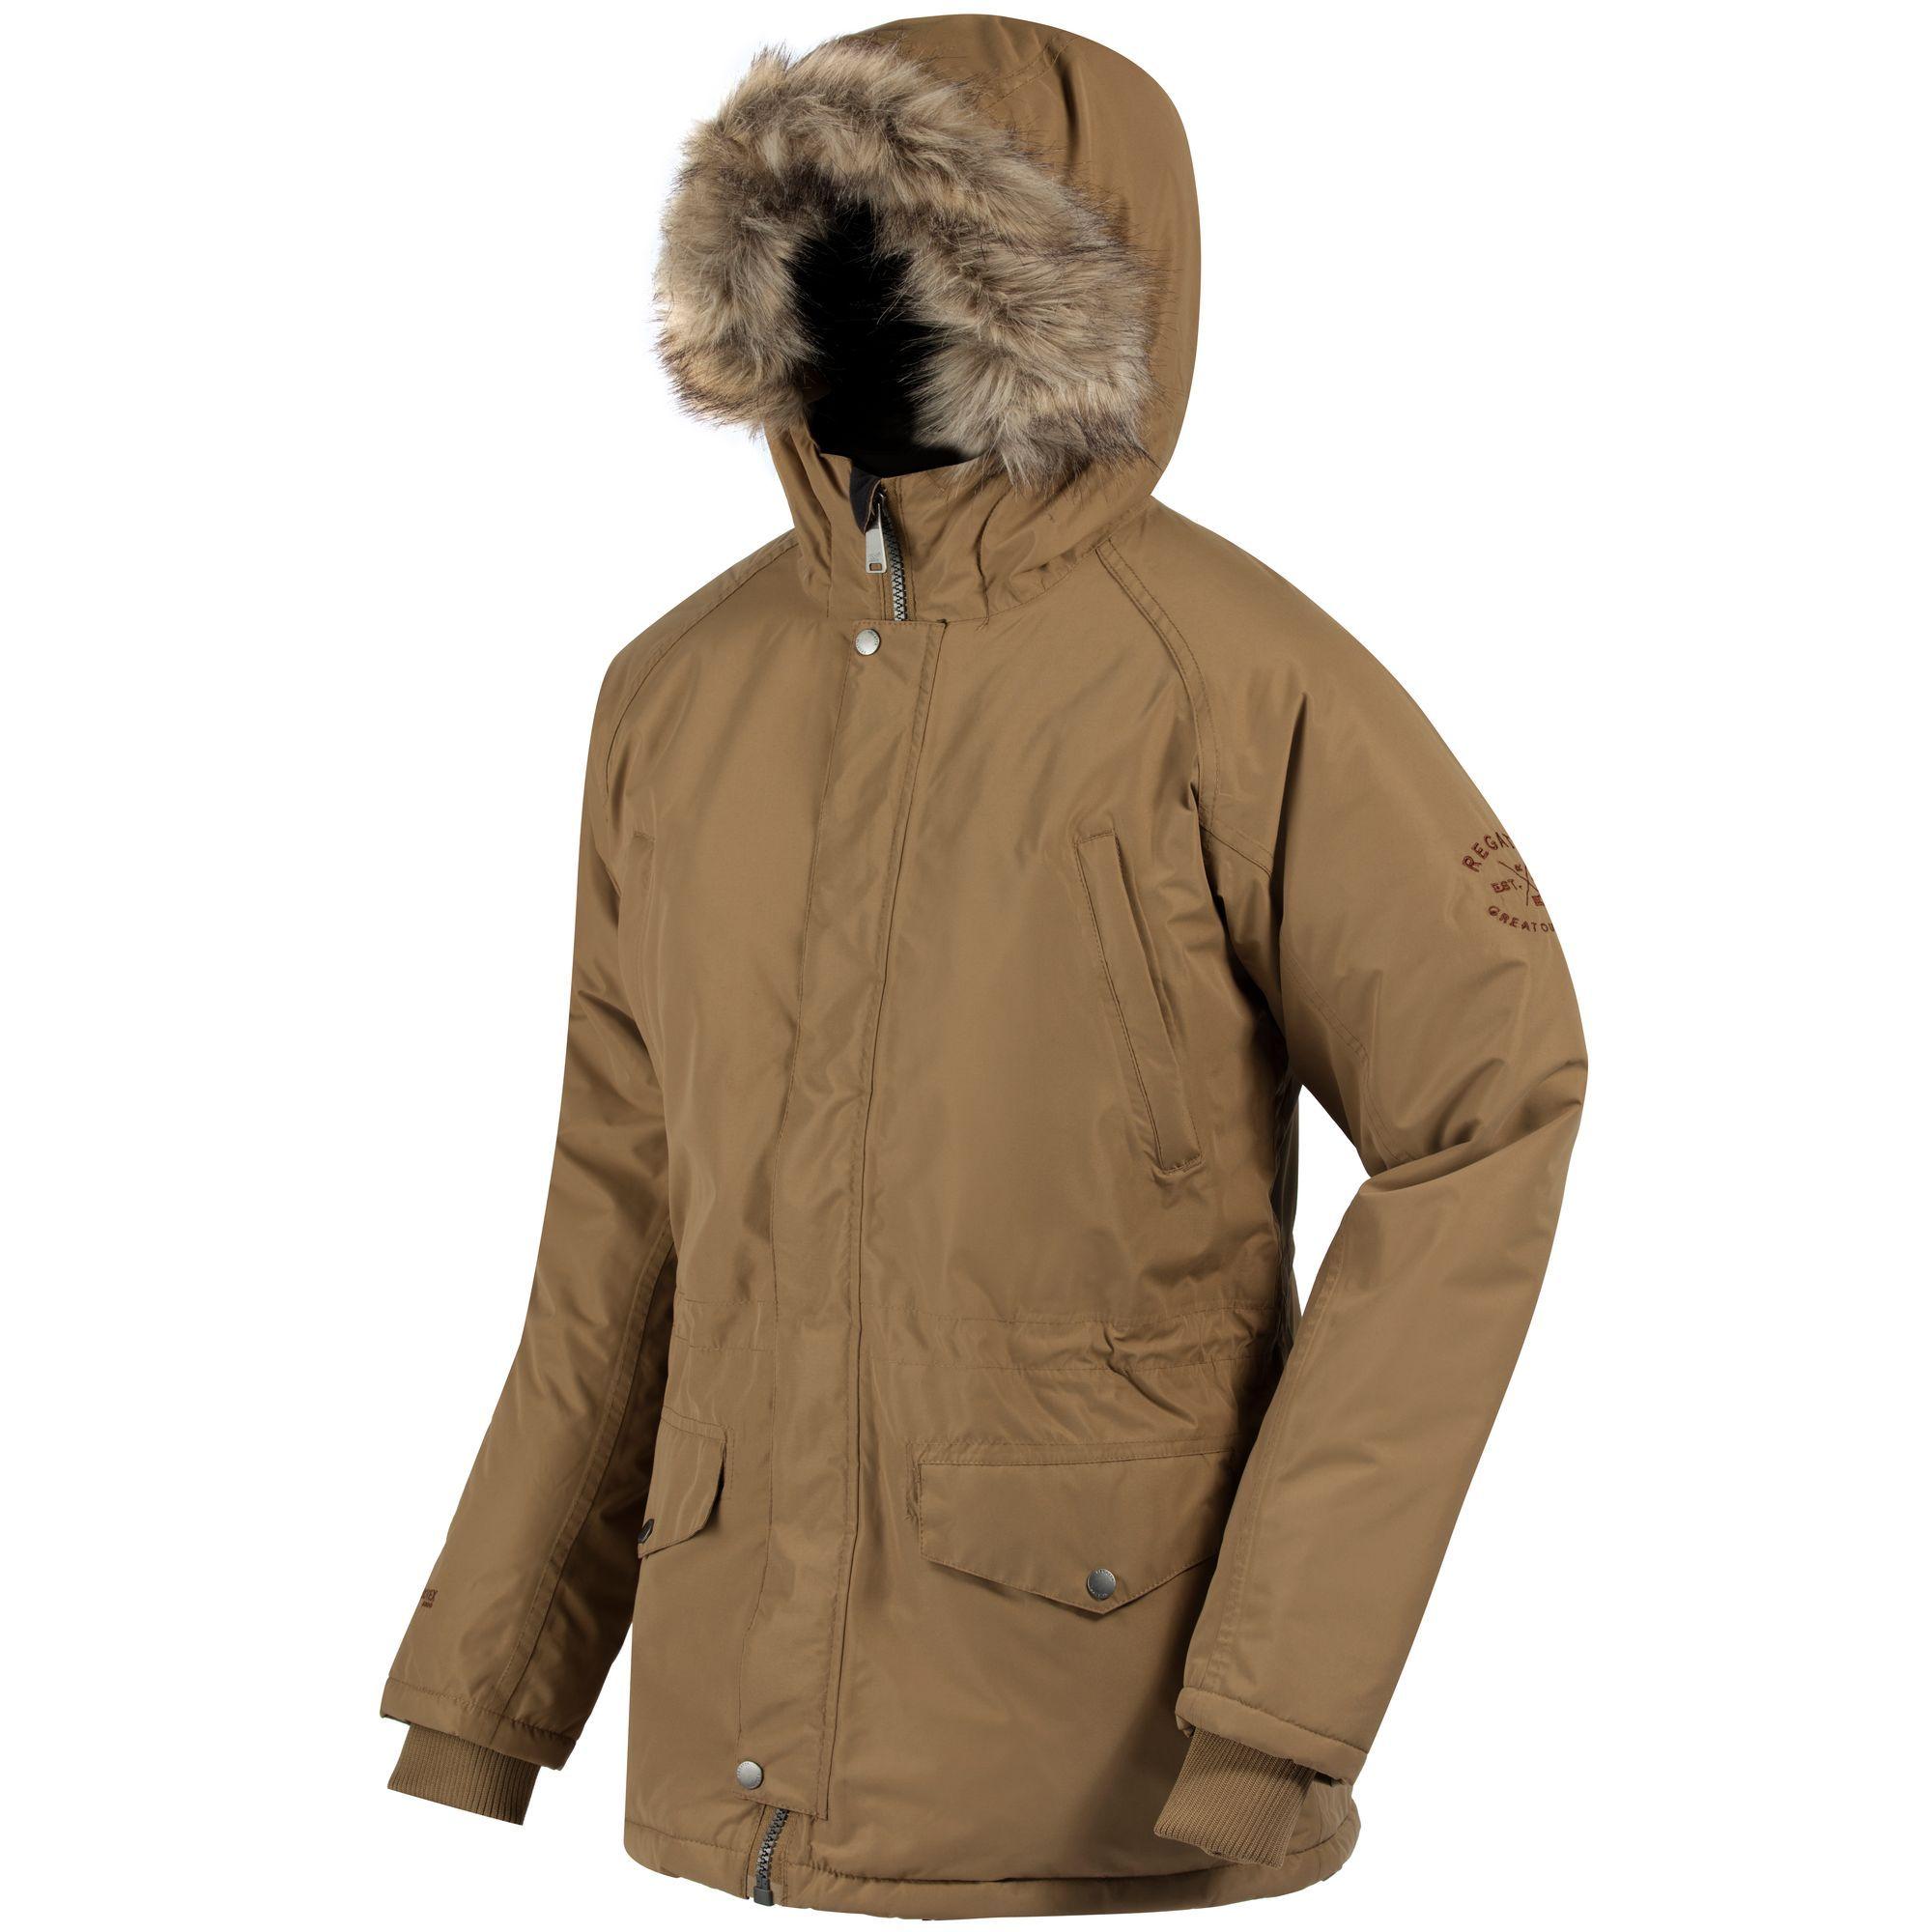 Regatta Great Outdoors Mens Salton Waterproof Insulated Parka Jacket (Dark Camel)